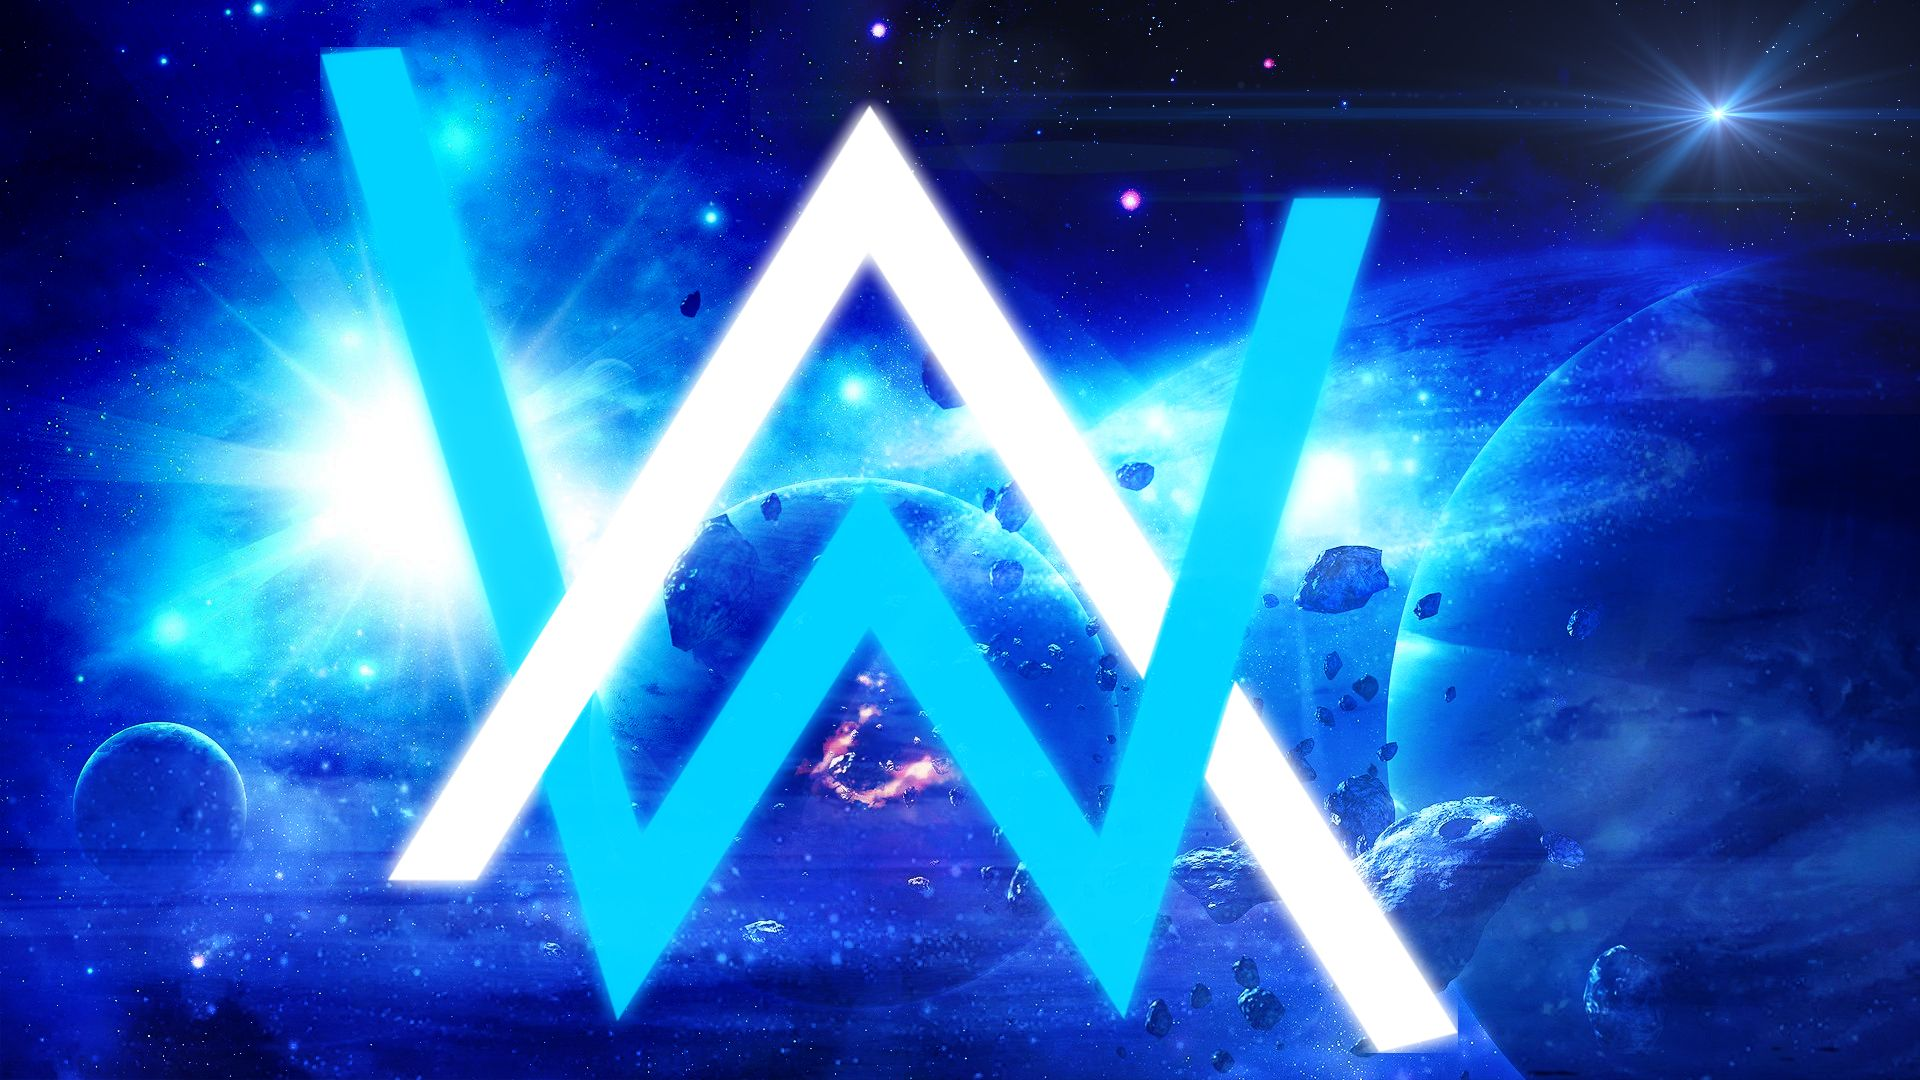 Alan Walker Logo Wallpapers Top Free Alan Walker Logo Backgrounds Wallpaperaccess